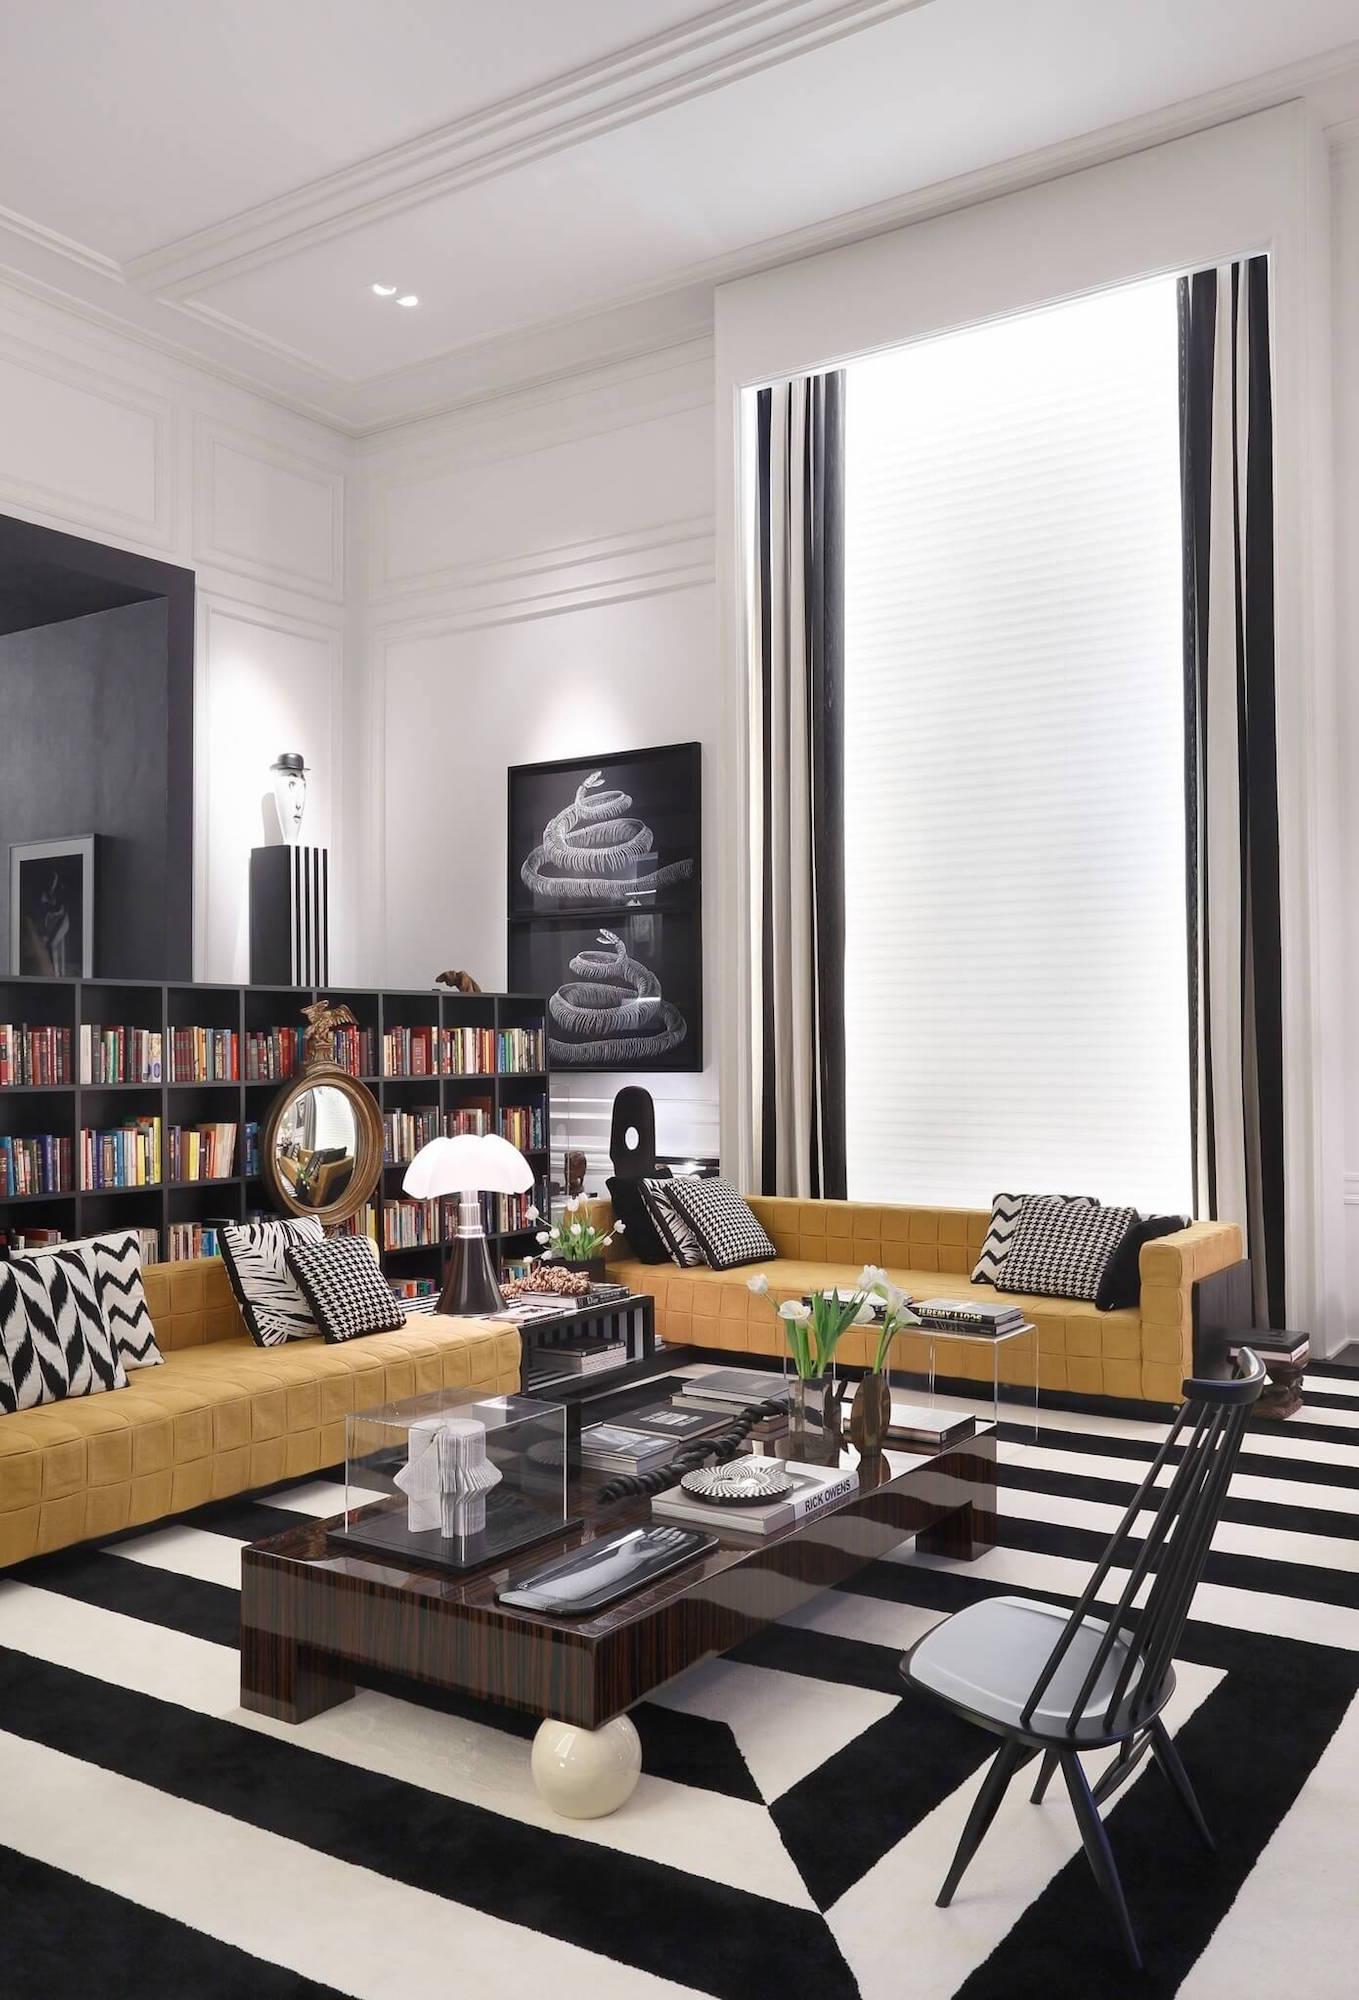 2015 Casa Cor Todeschini Pavilion-studio-guilherme-torres-03